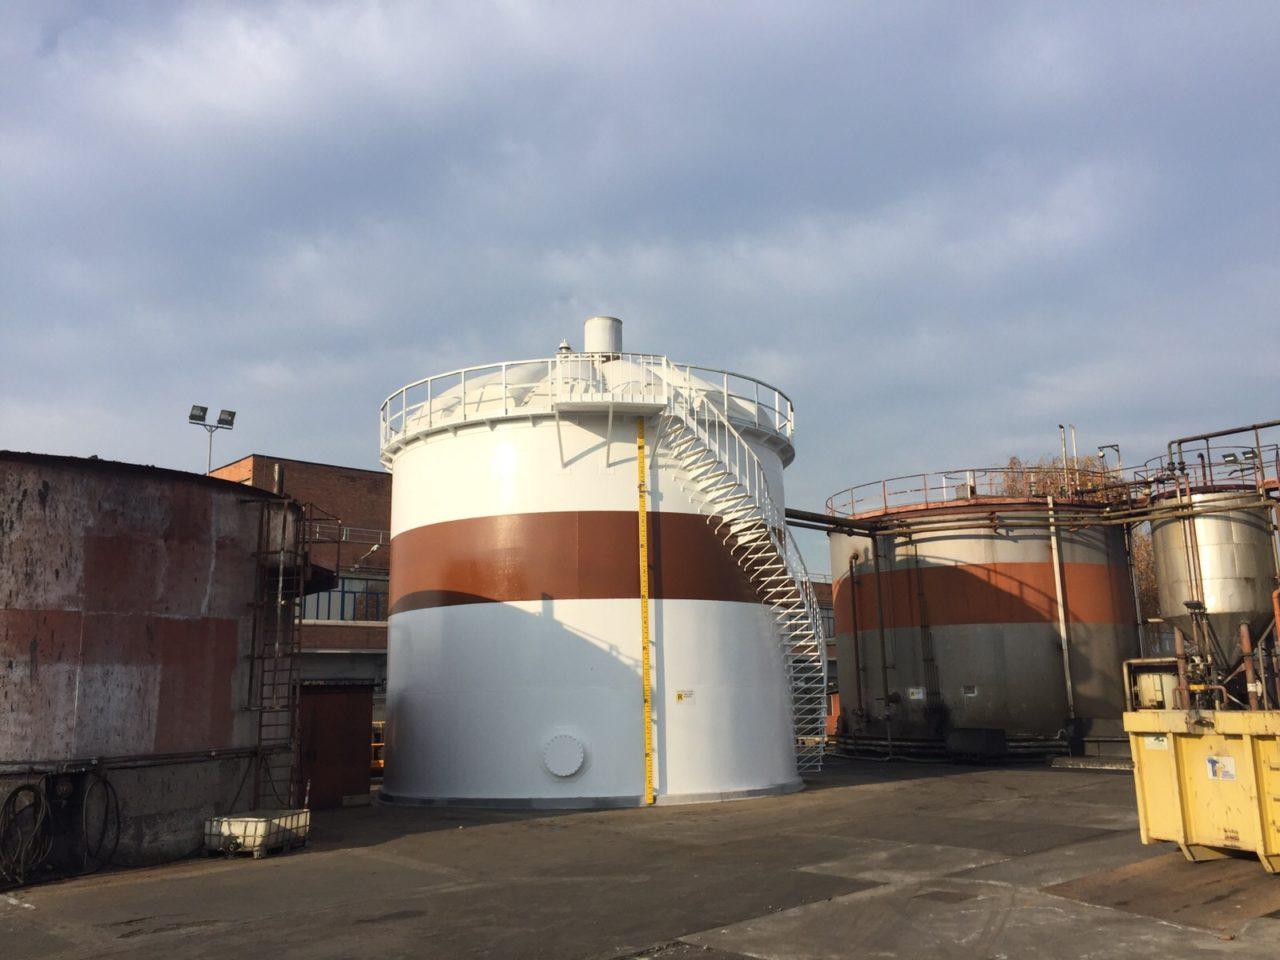 Refurbished storage tank